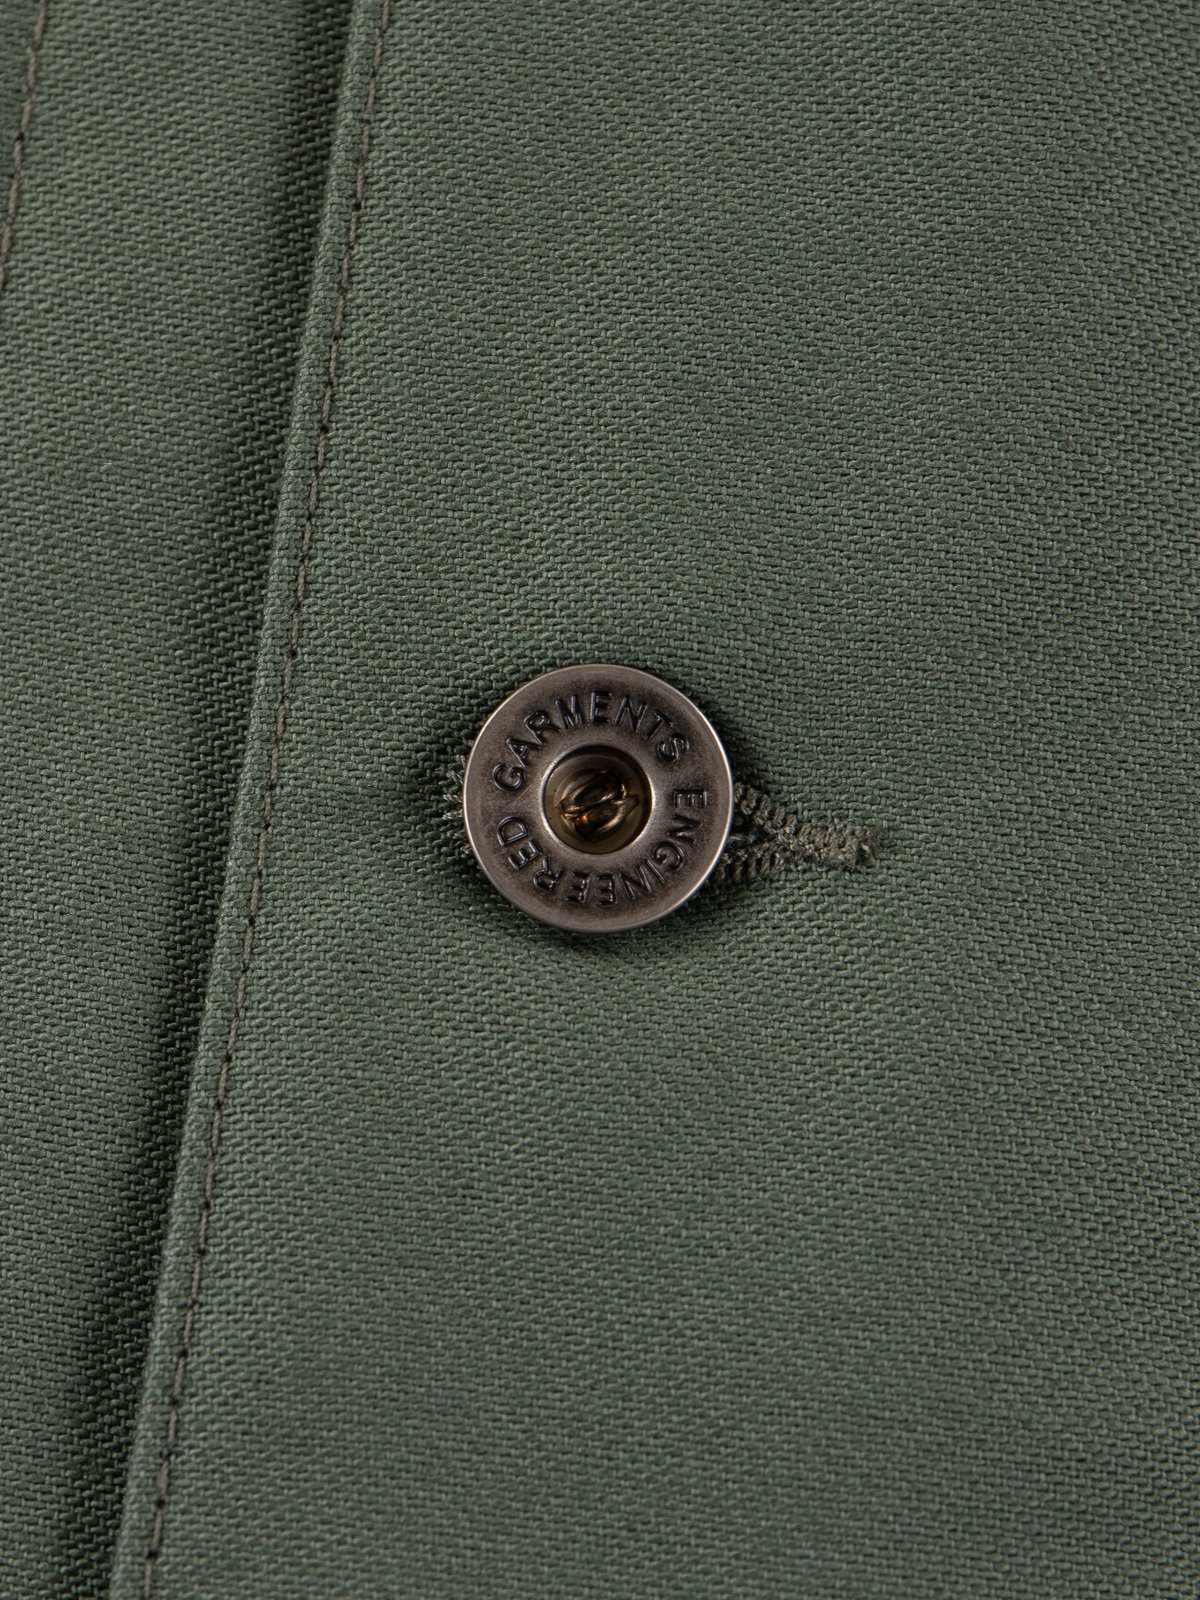 Olive Reversed Sateen Shop Coat - Image 4